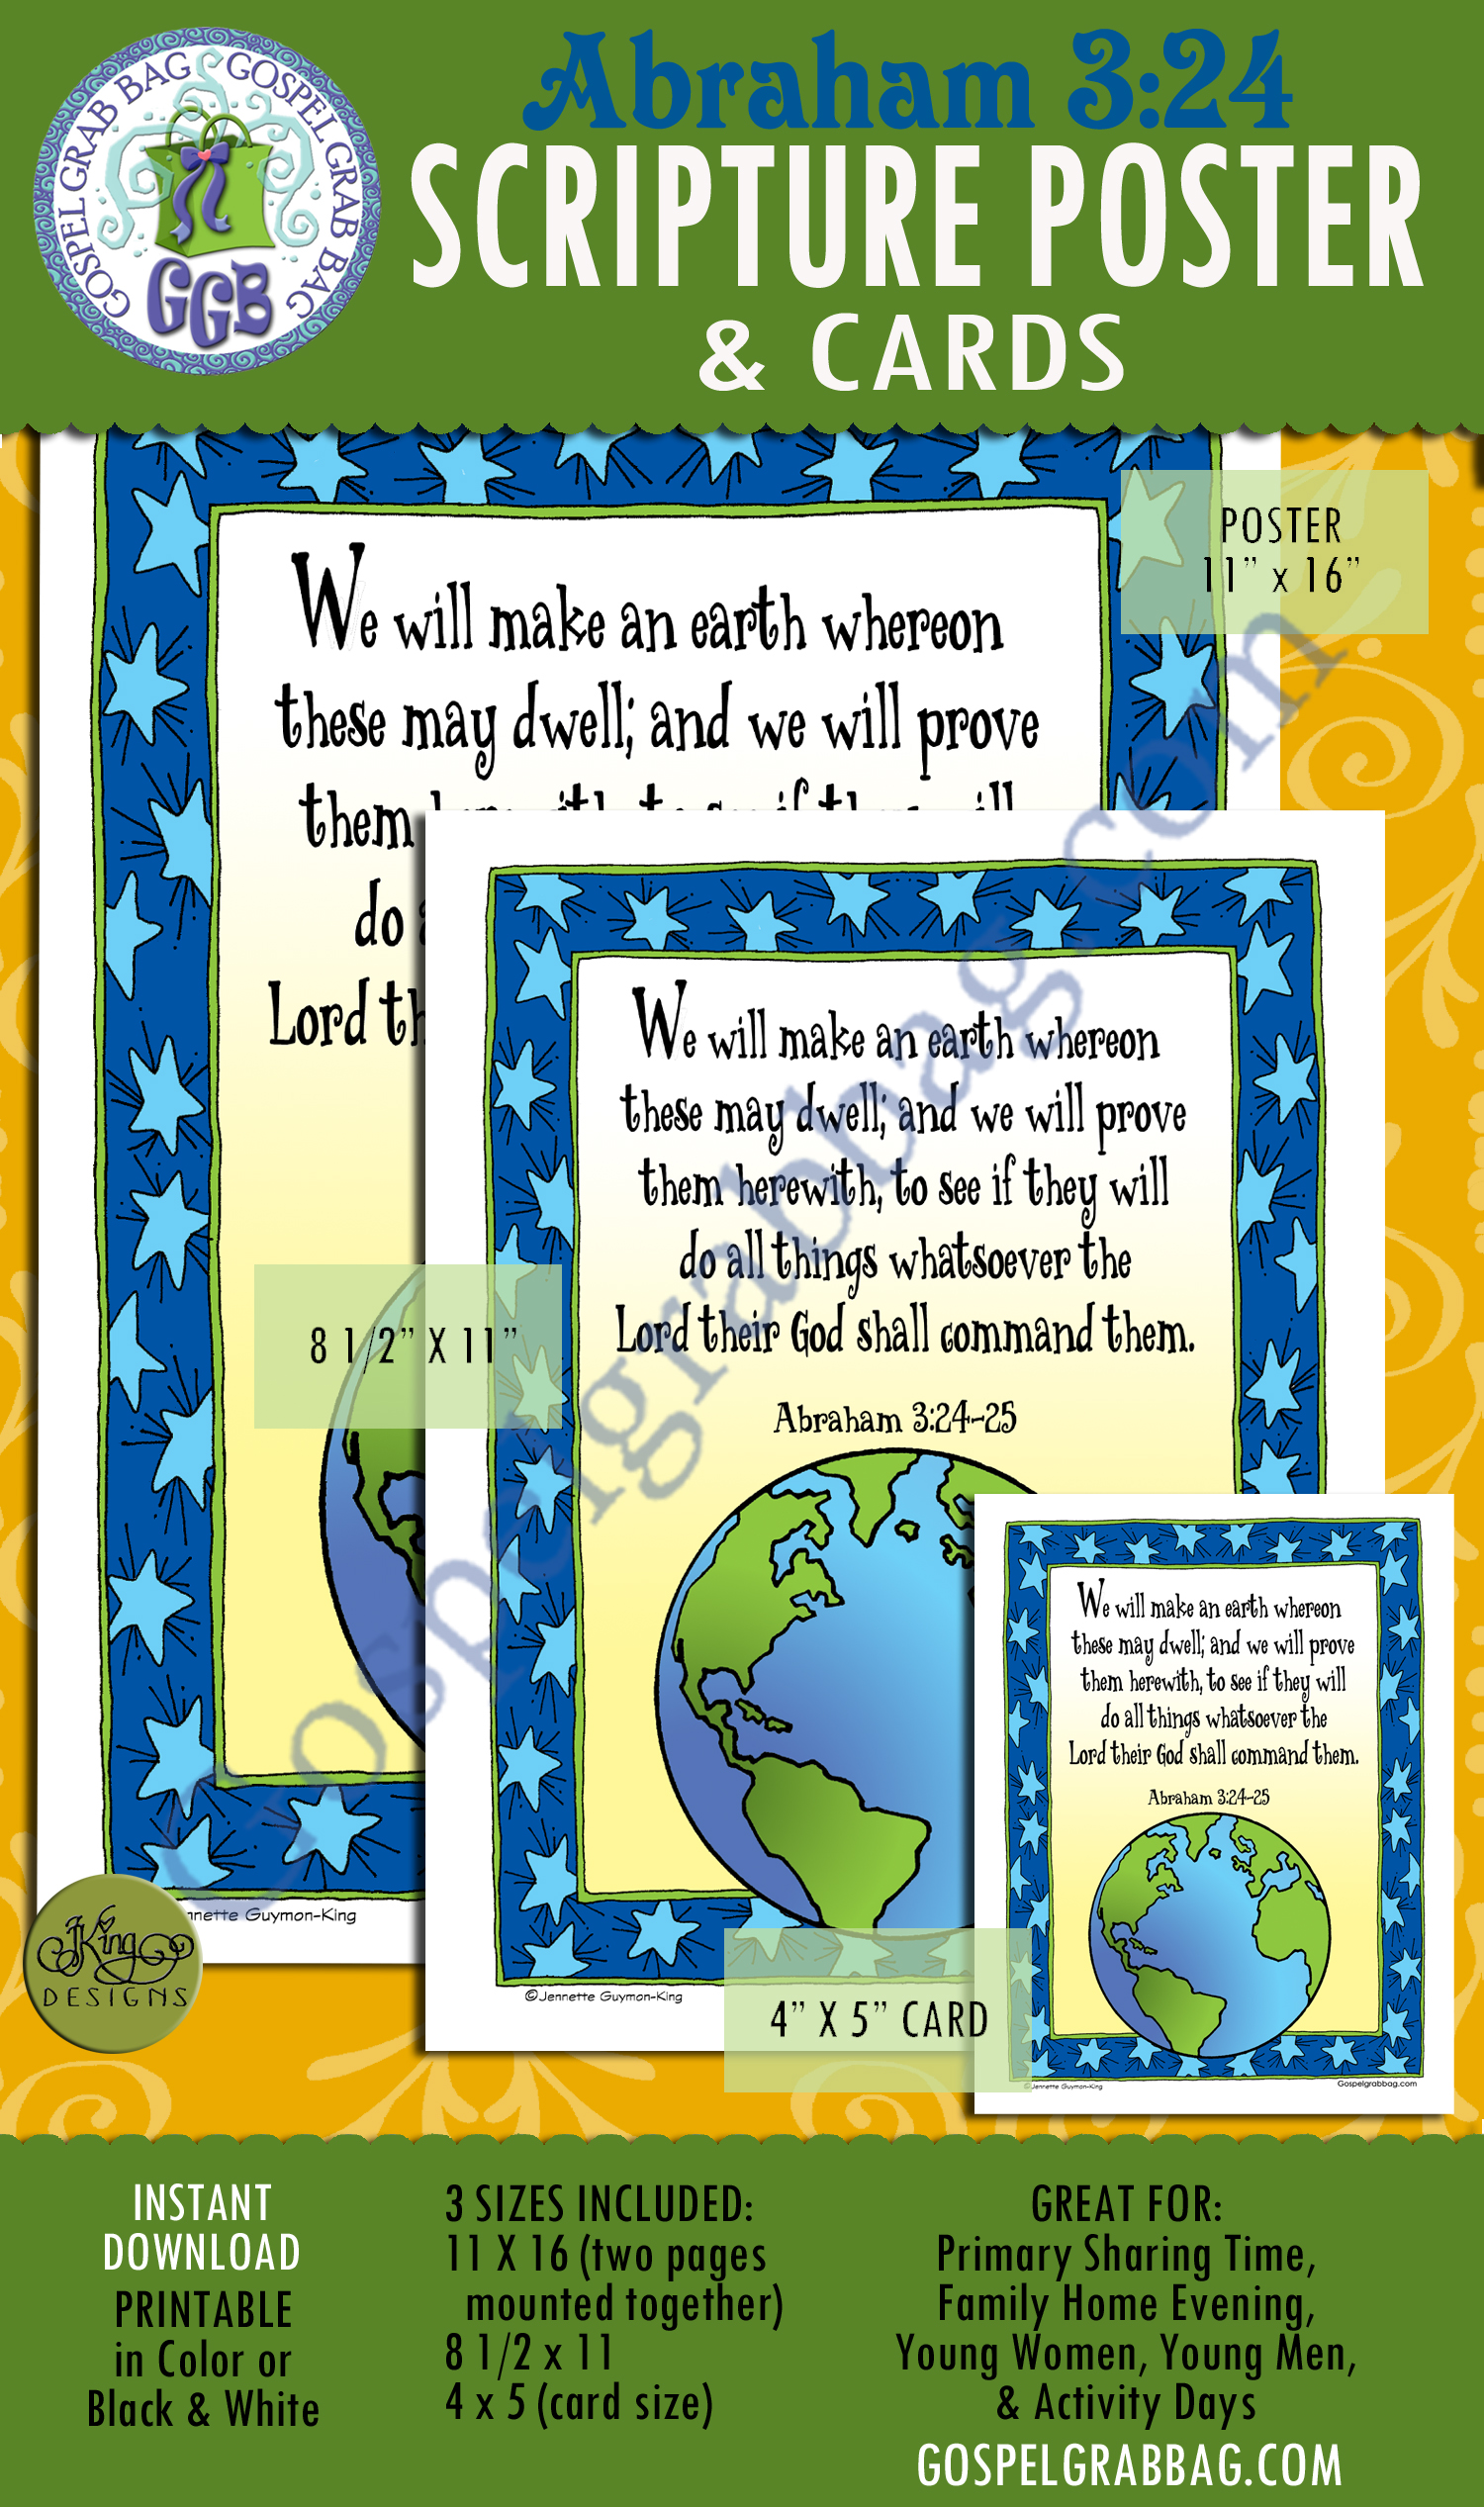 Abraham 43:24-25 SCRIPTURE POSTER & CARDS, Creation, Plan of Salvation, Primary Sharing Time, Come Follow Me, GospelGrabBag.com